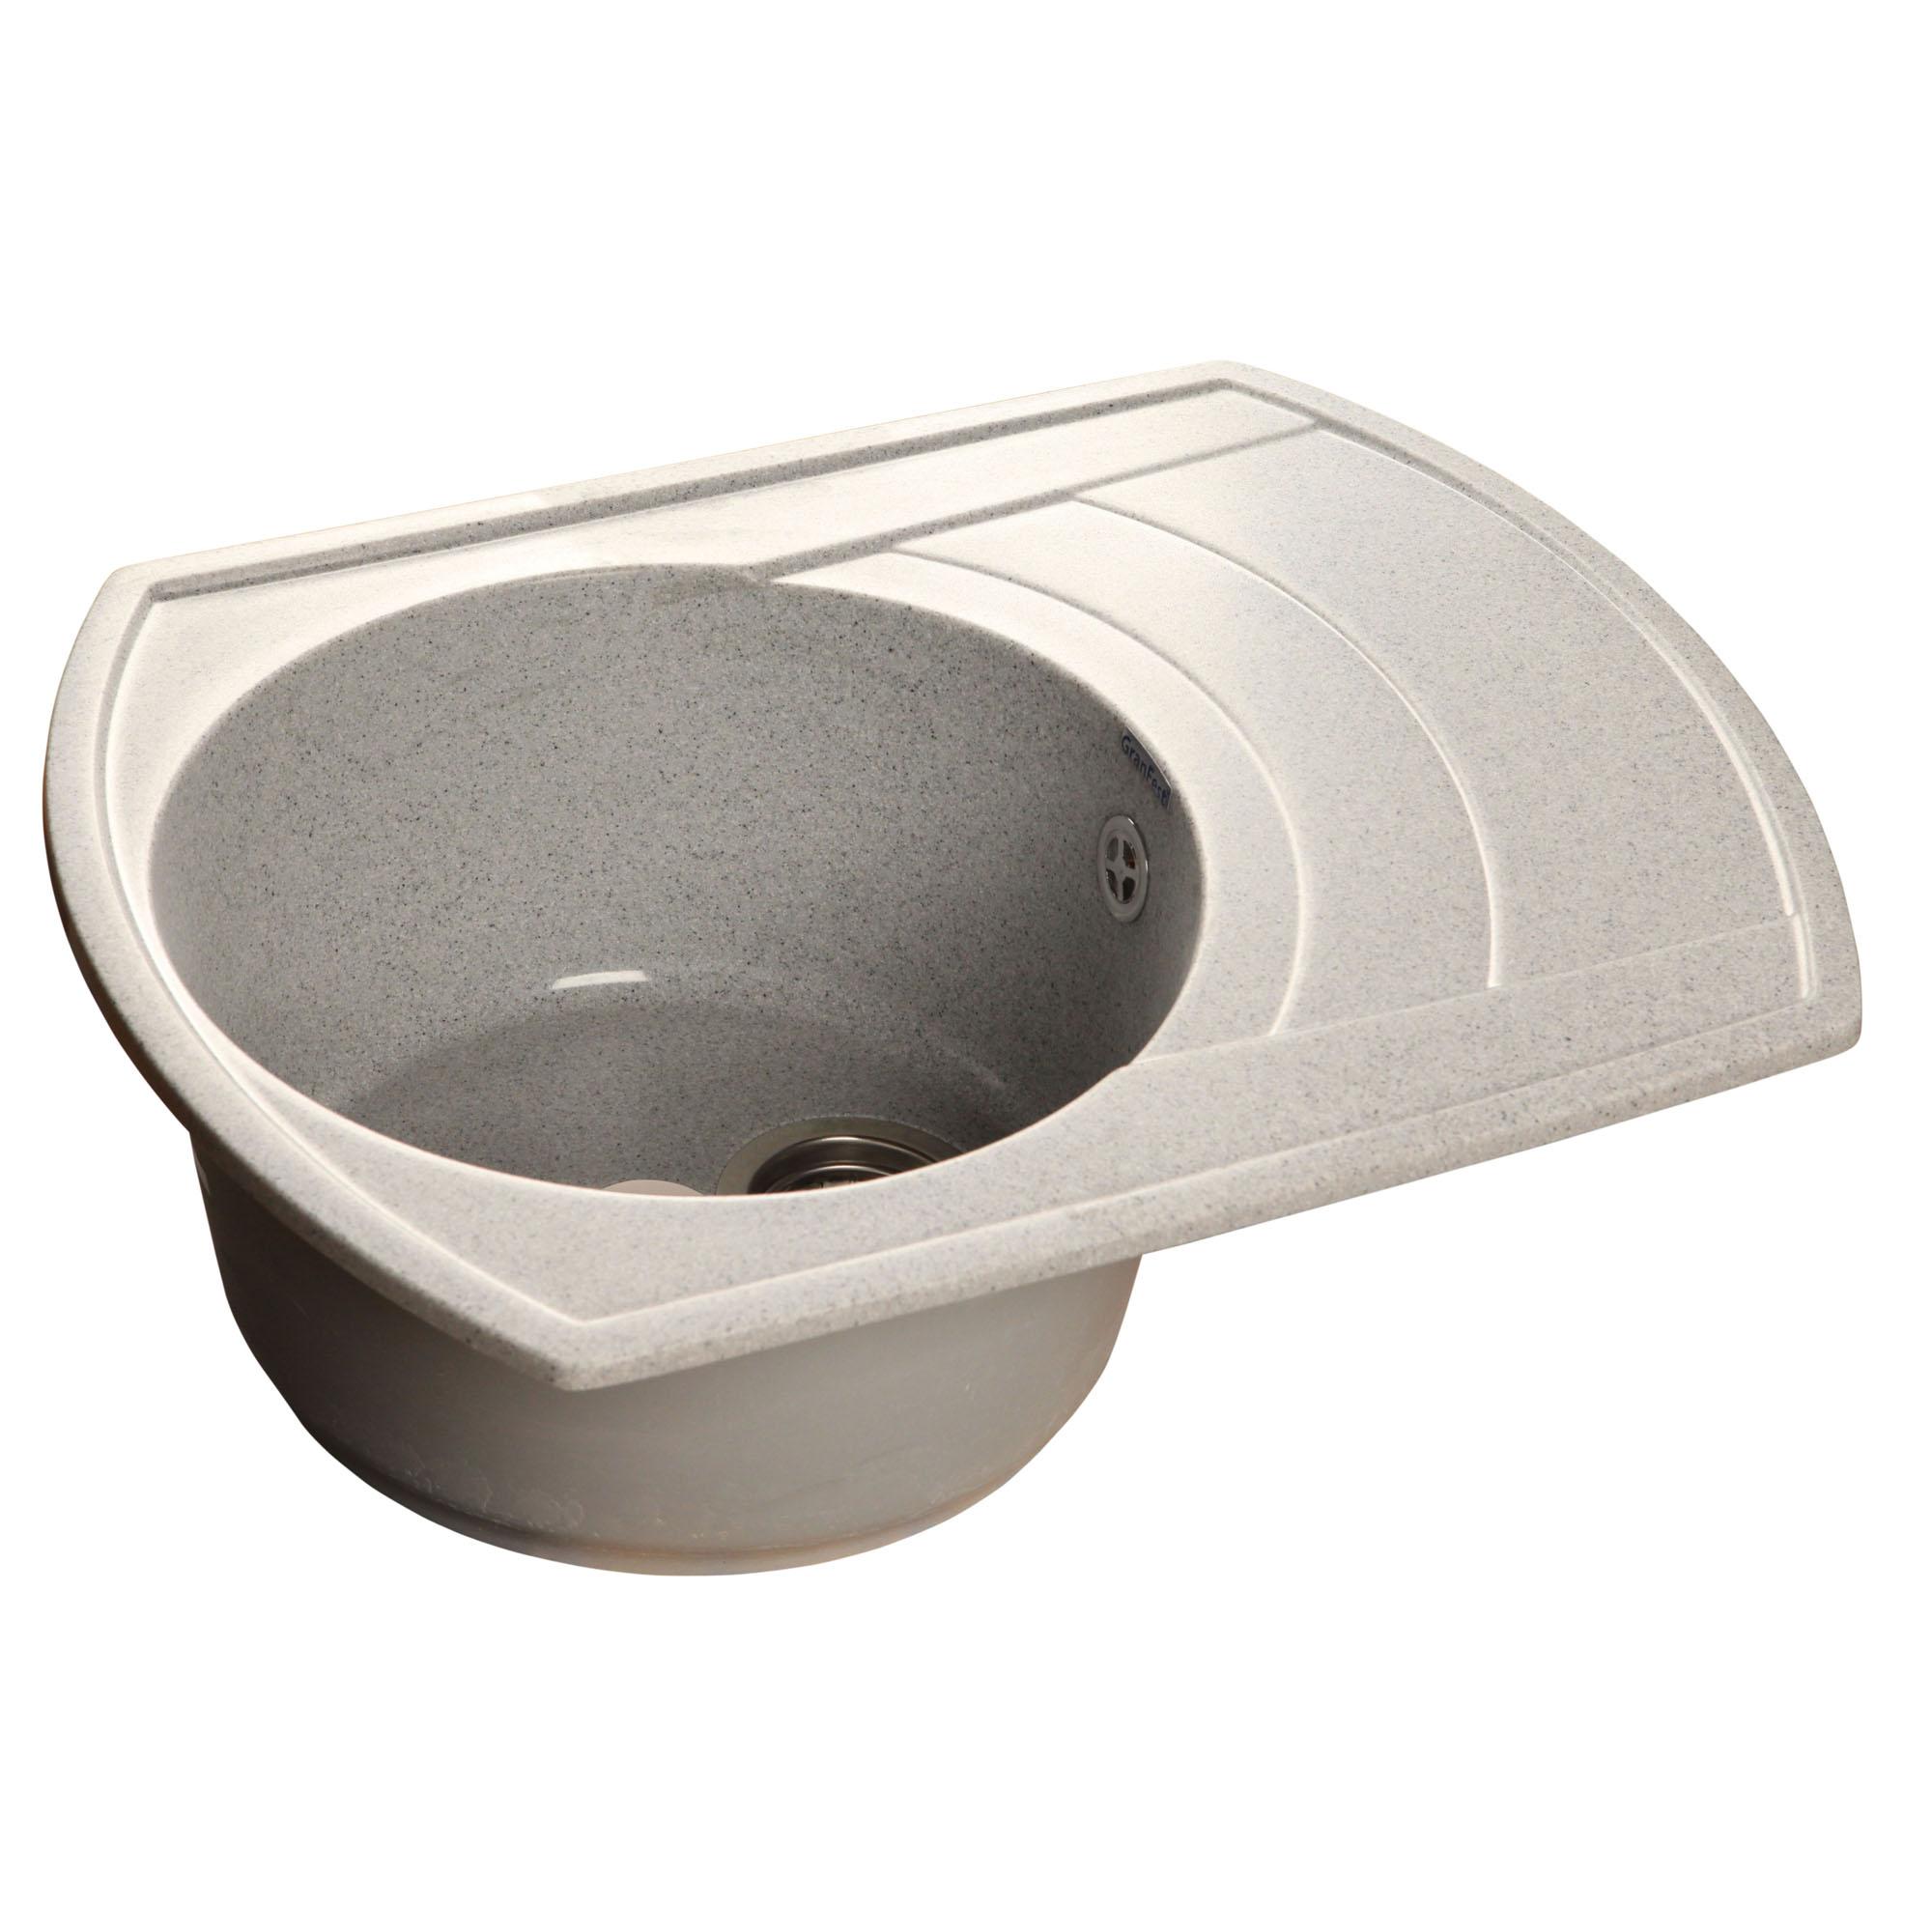 Кухонная мойка GranFest Rondo GF-R650L серый мойка кухонная granfest гранит 650x500 чаша крыло gf r650l черная